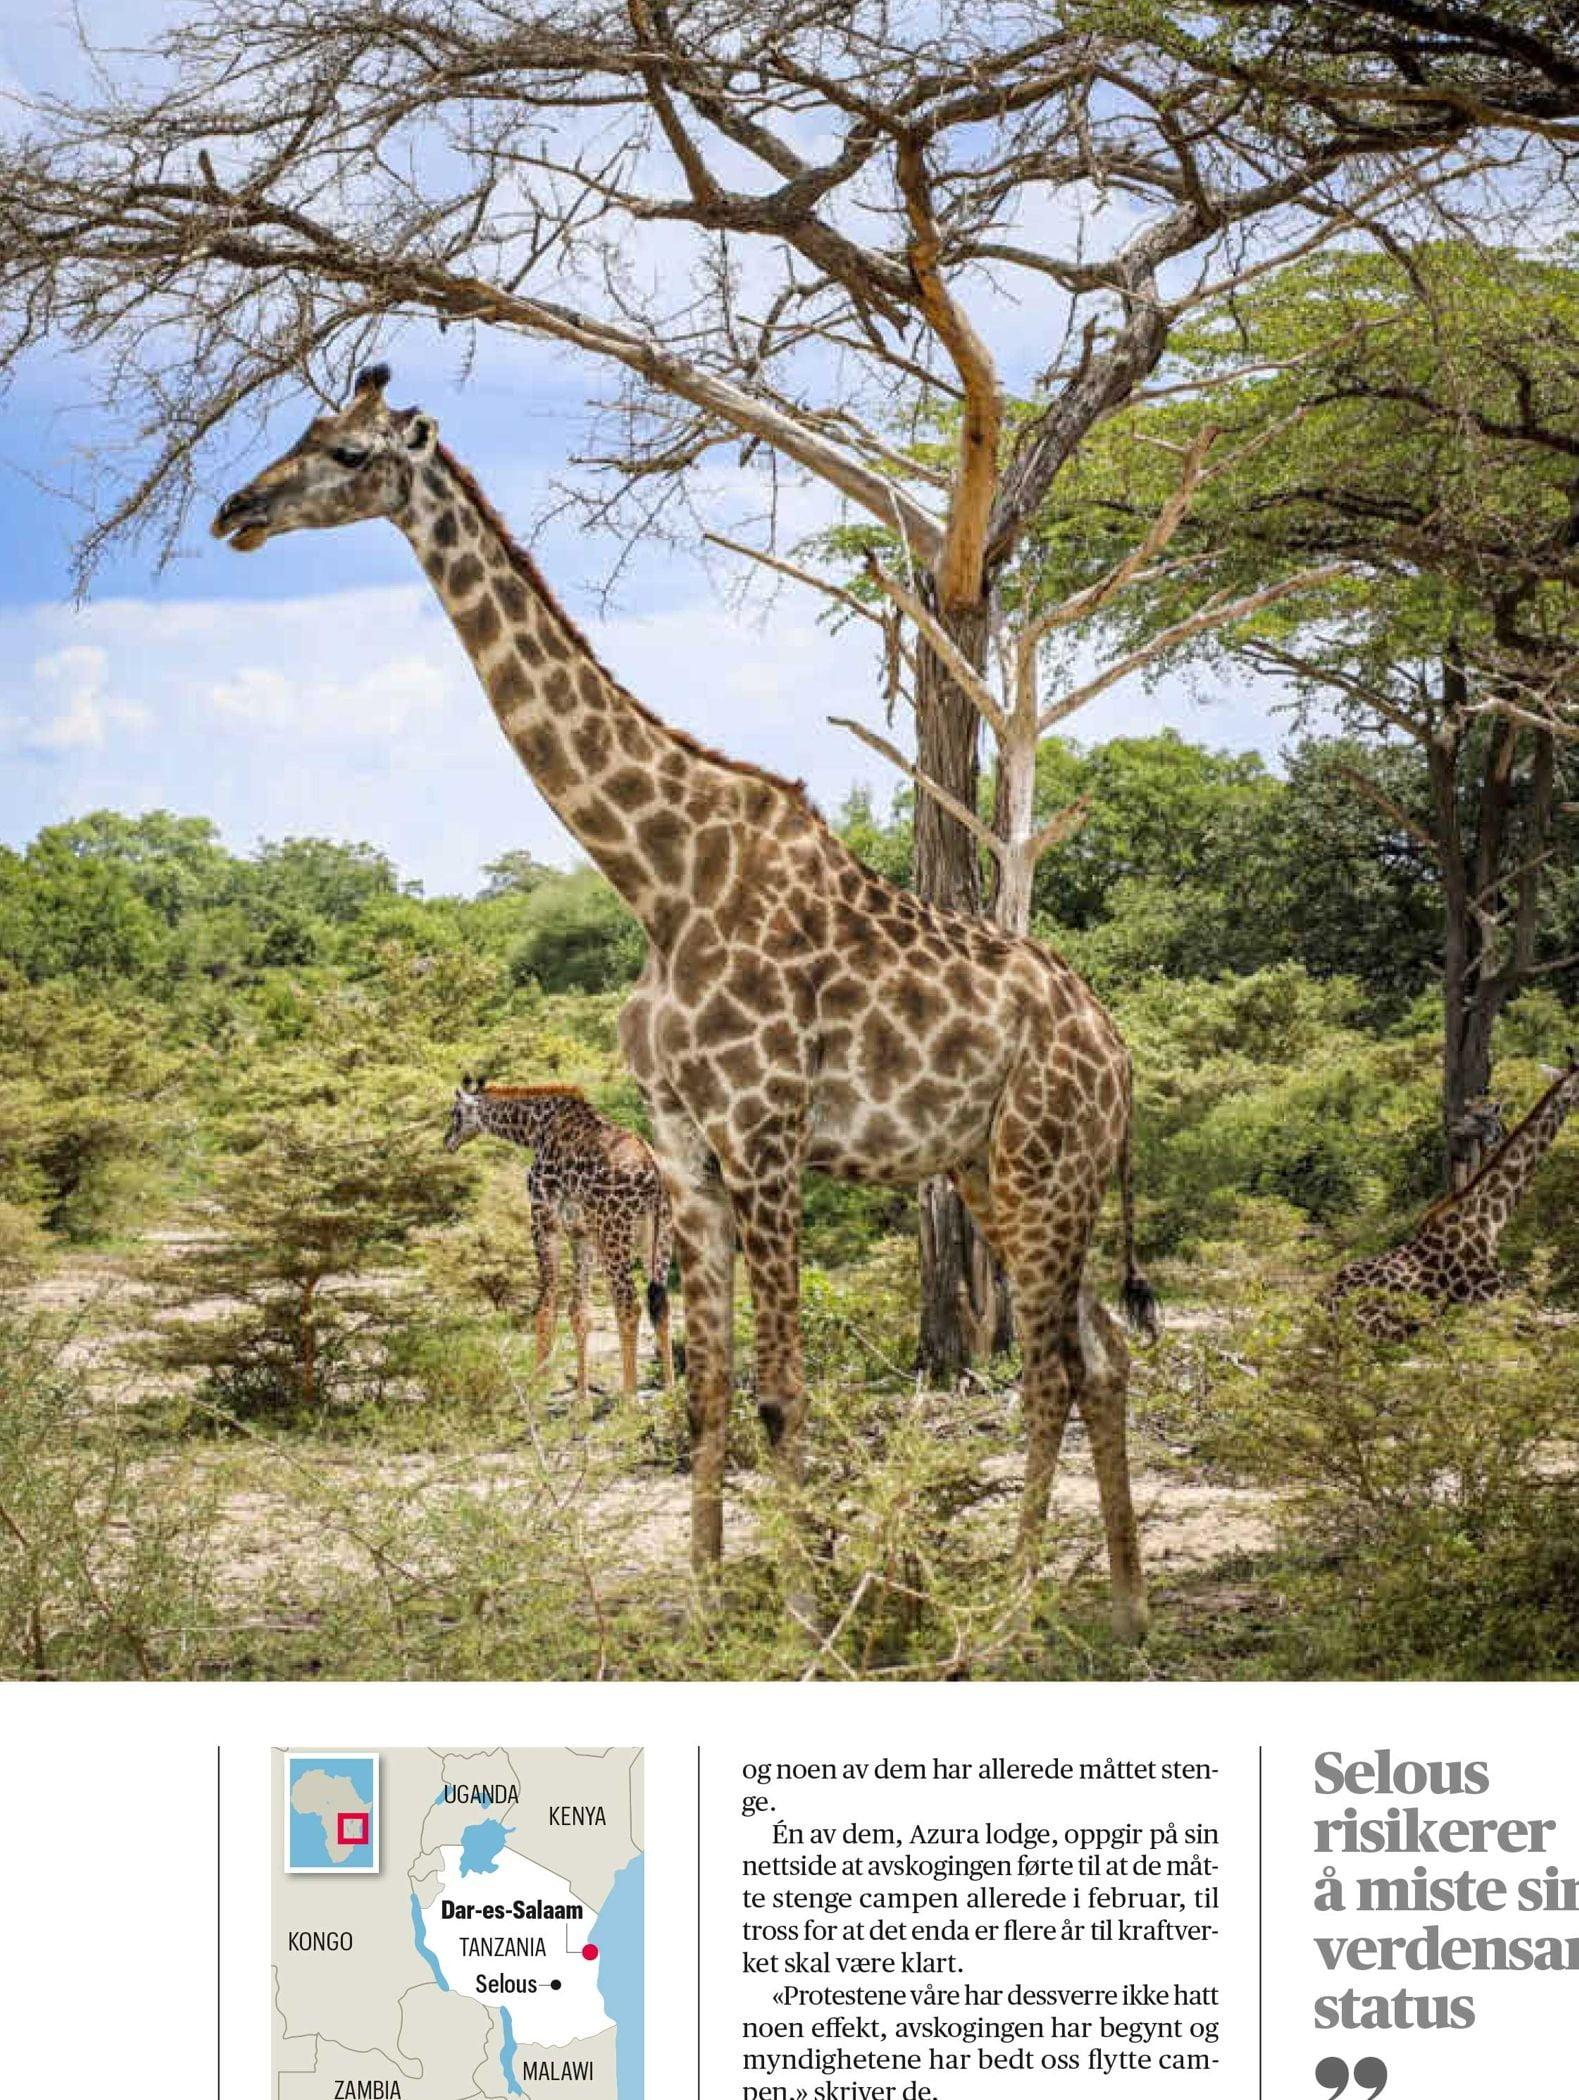 Plant community, Natural landscape, Giraffe, Giraffidae, Sky, Ecoregion, Neck, Tree